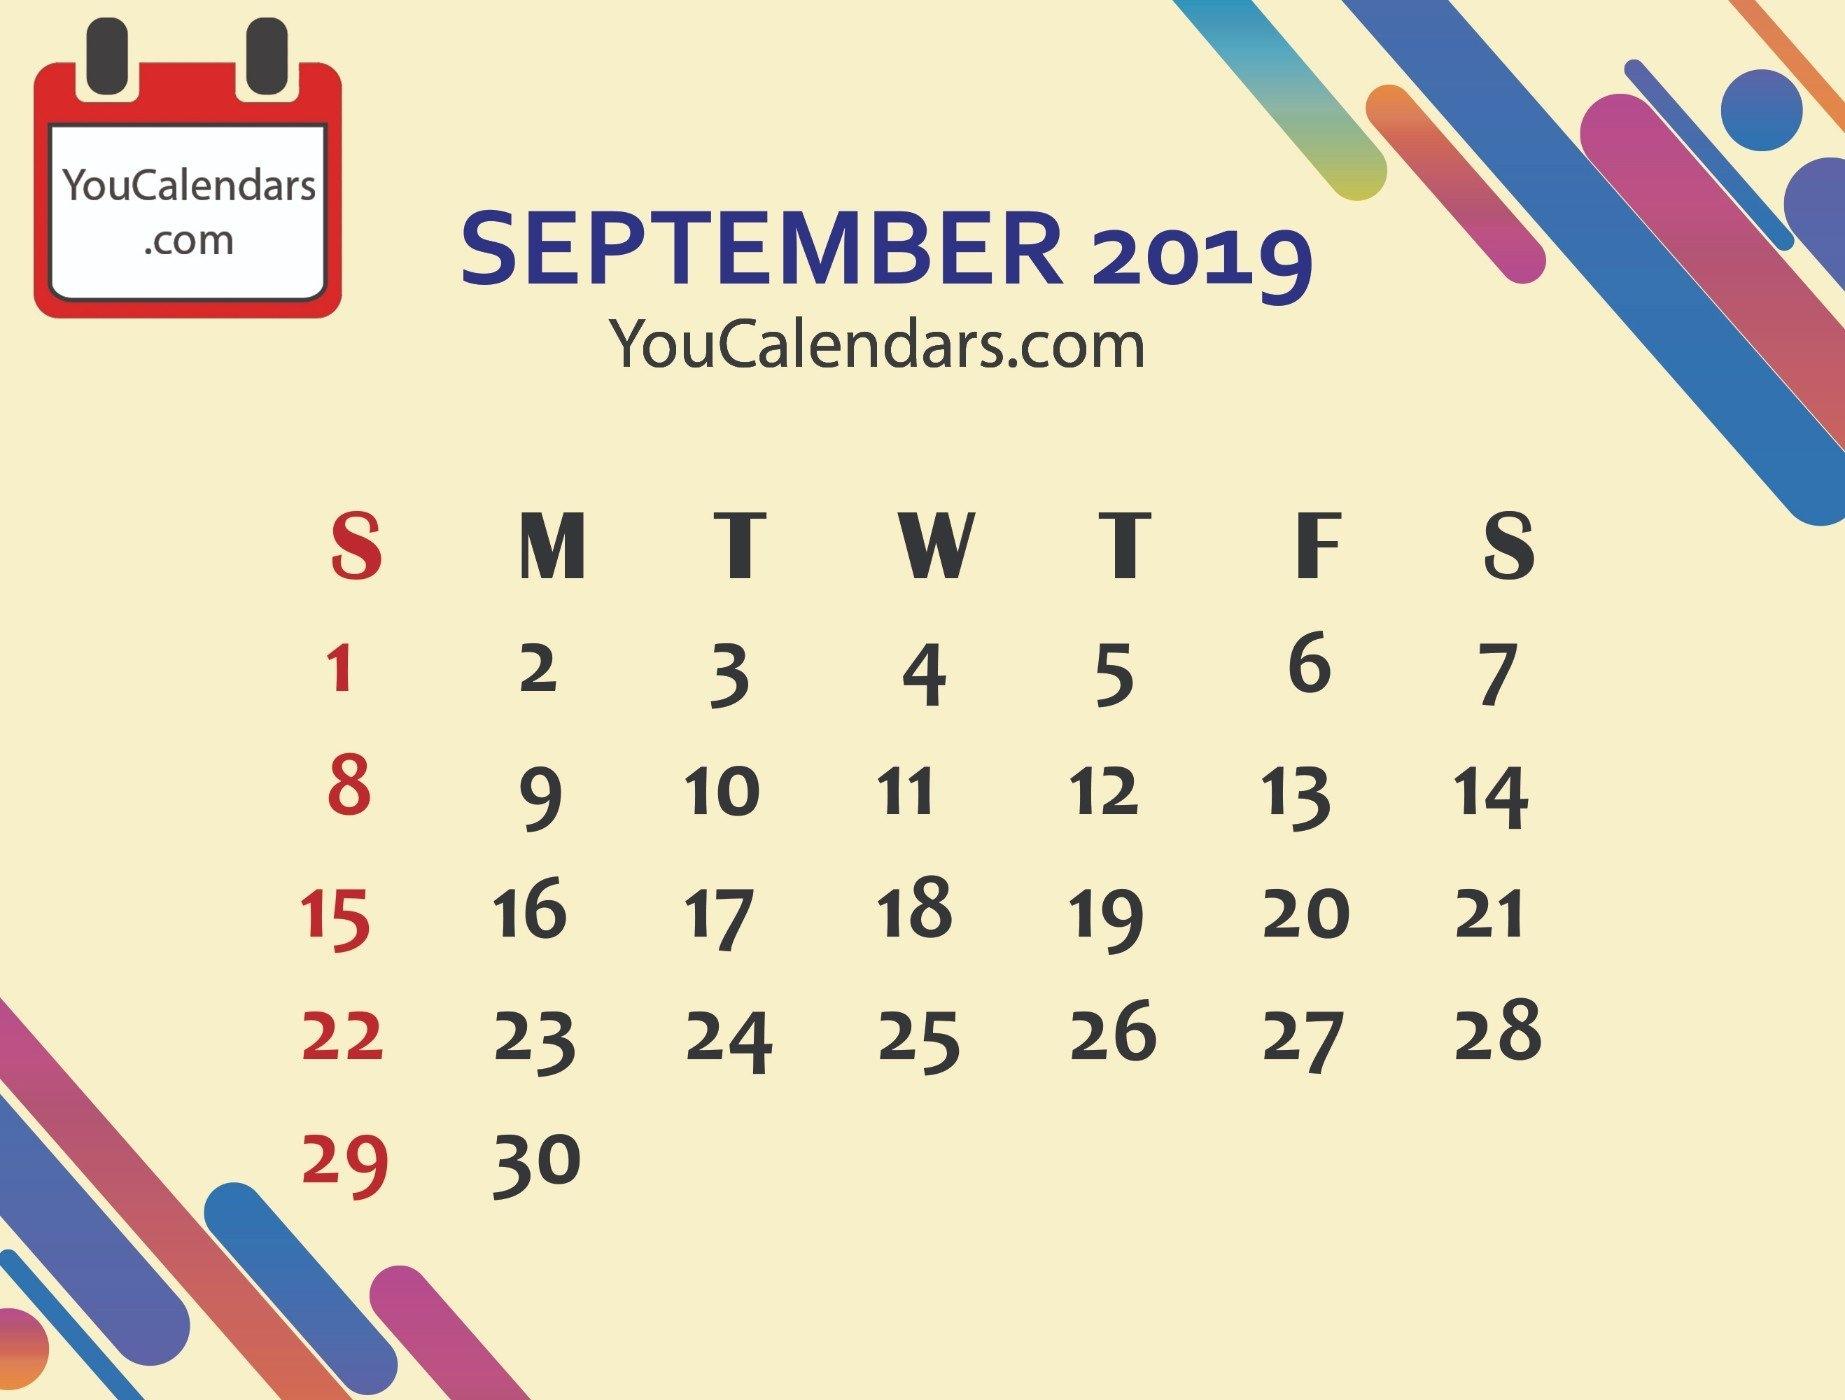 Free September 2019 Calendar Printable Template – You Calendars September 7 2019 Calendar